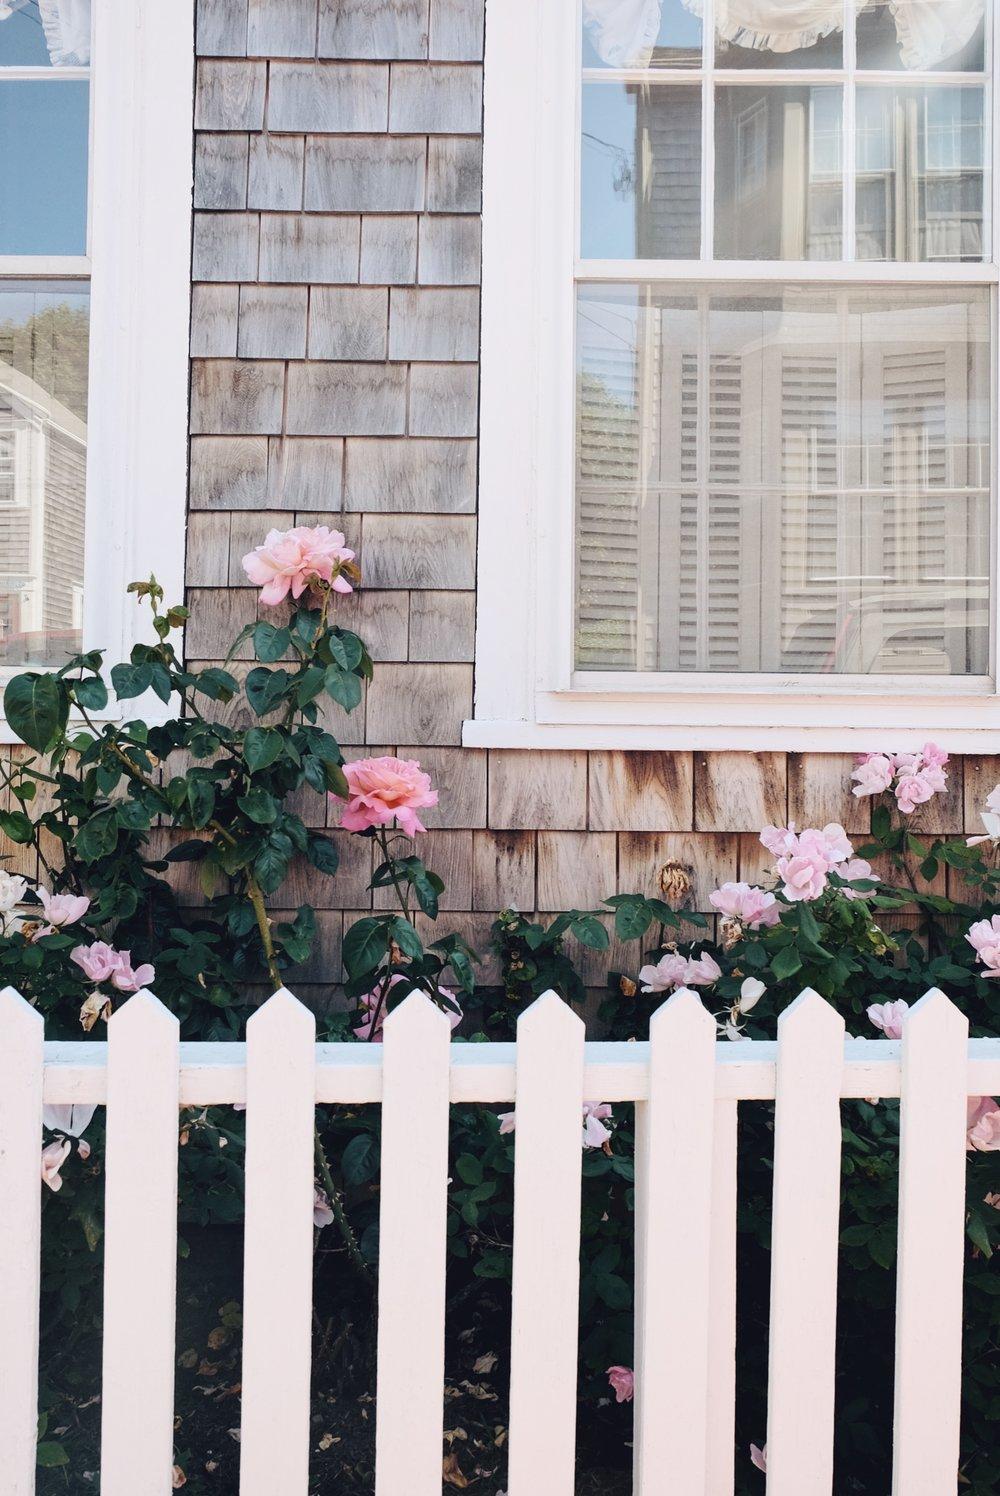 The Far & Near Travel Guide to Nantucket Dulci Edge